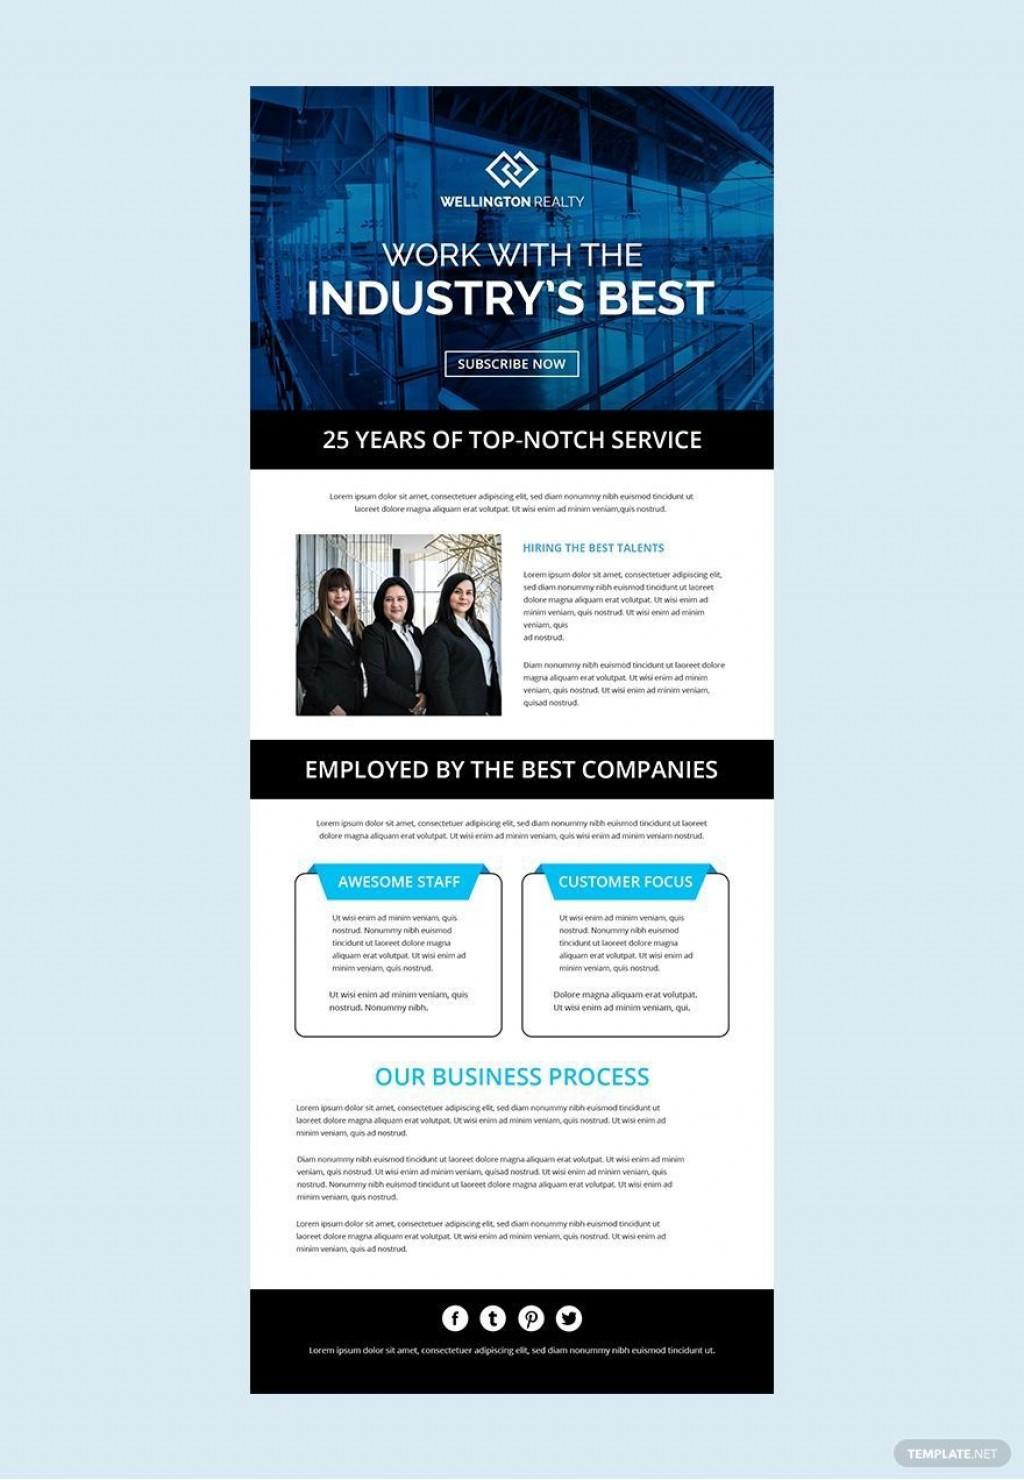 001 Excellent Free Email Newsletter Template Download Inspiration  Busines PsdLarge